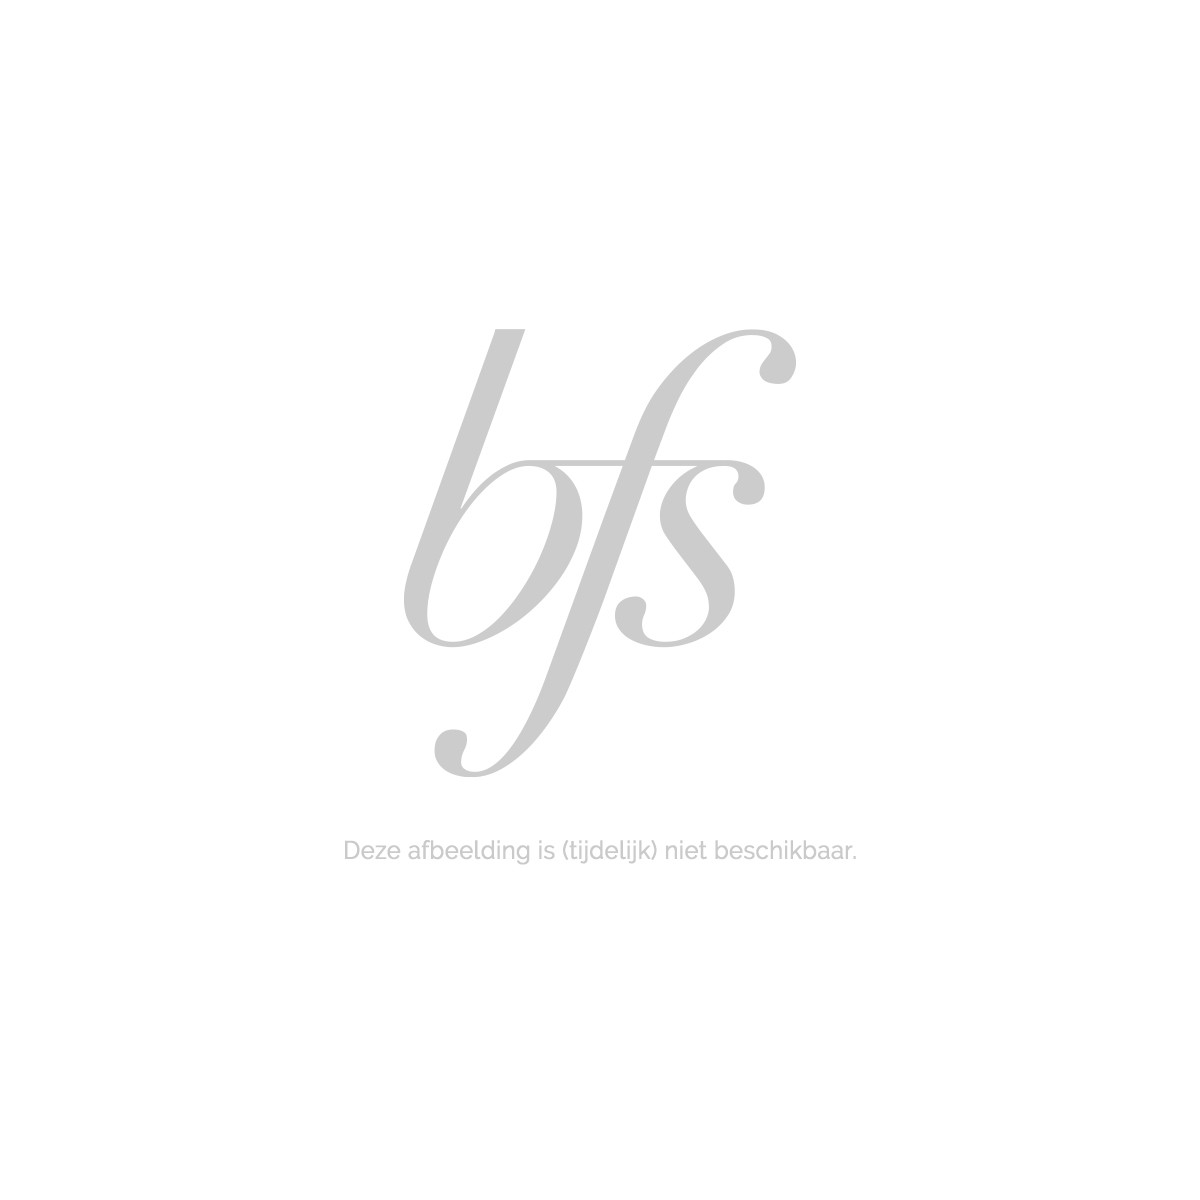 Shiseido Perfect Mascara Full Definition #901 8 ml